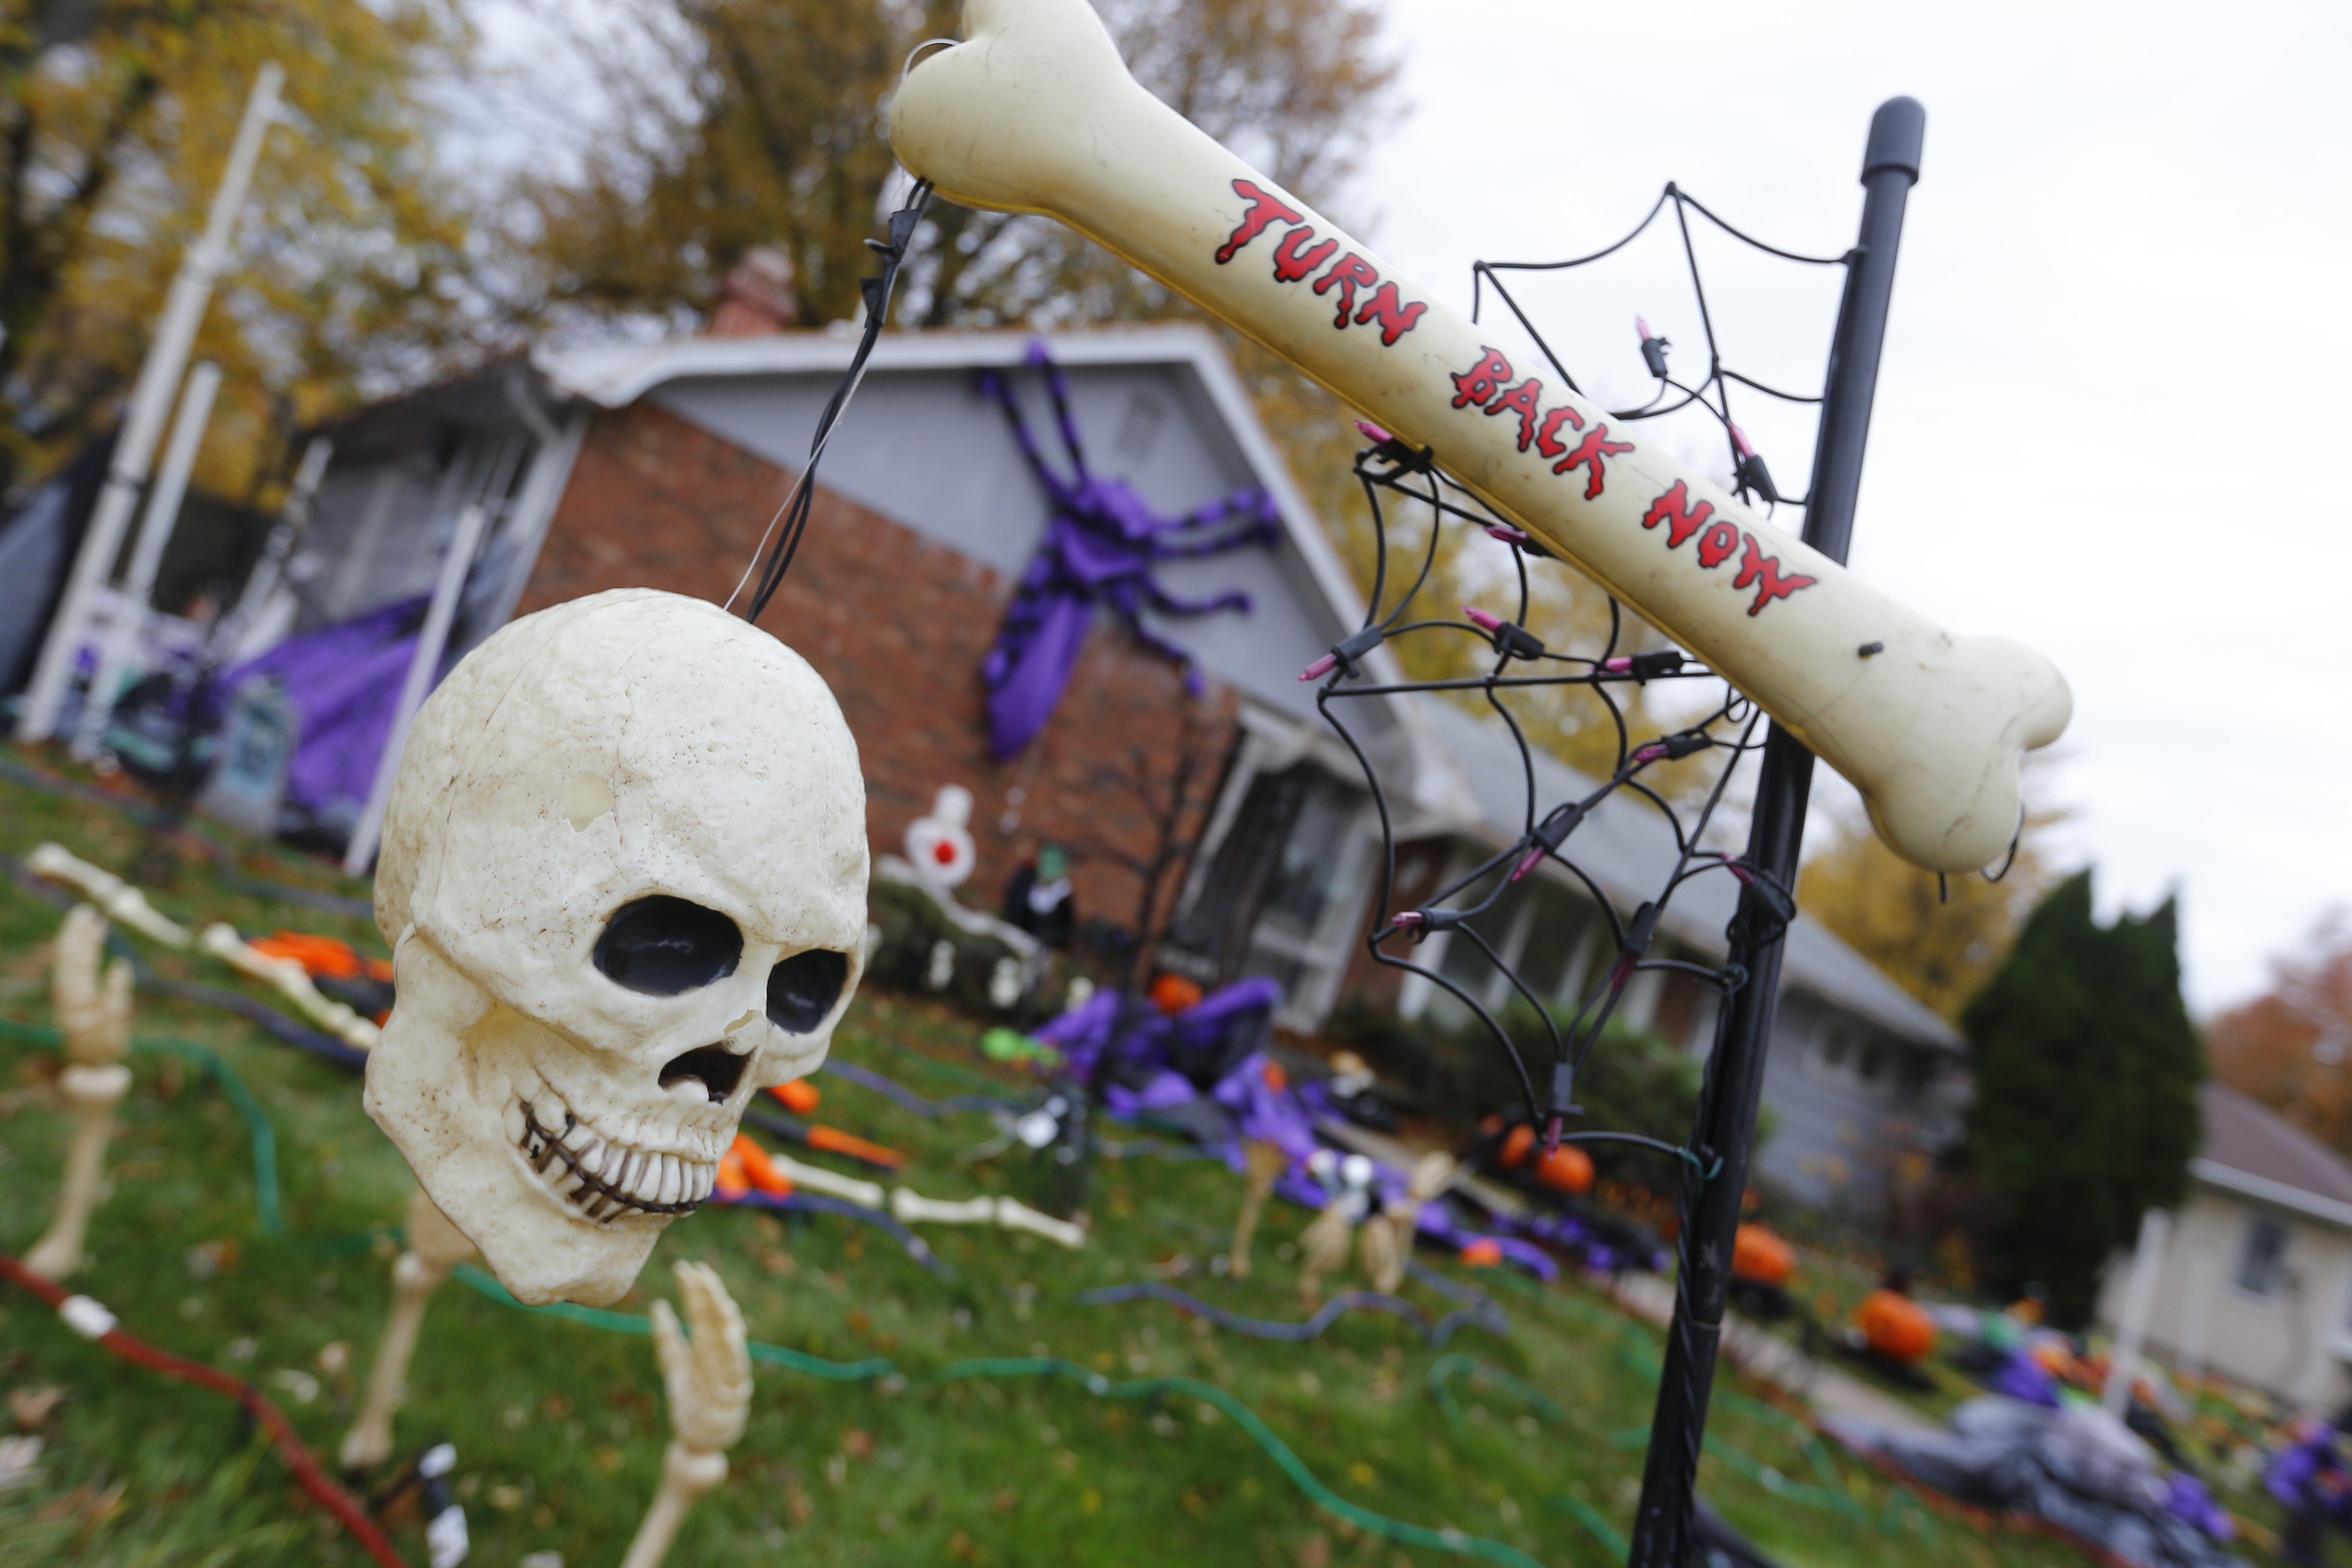 Halloween decoarations  at  Dushane and Parker Blvd.  in Town of Tonawanda, N.Y. on Oct. 28, 2014 .(John Hickey/Buffalo News)